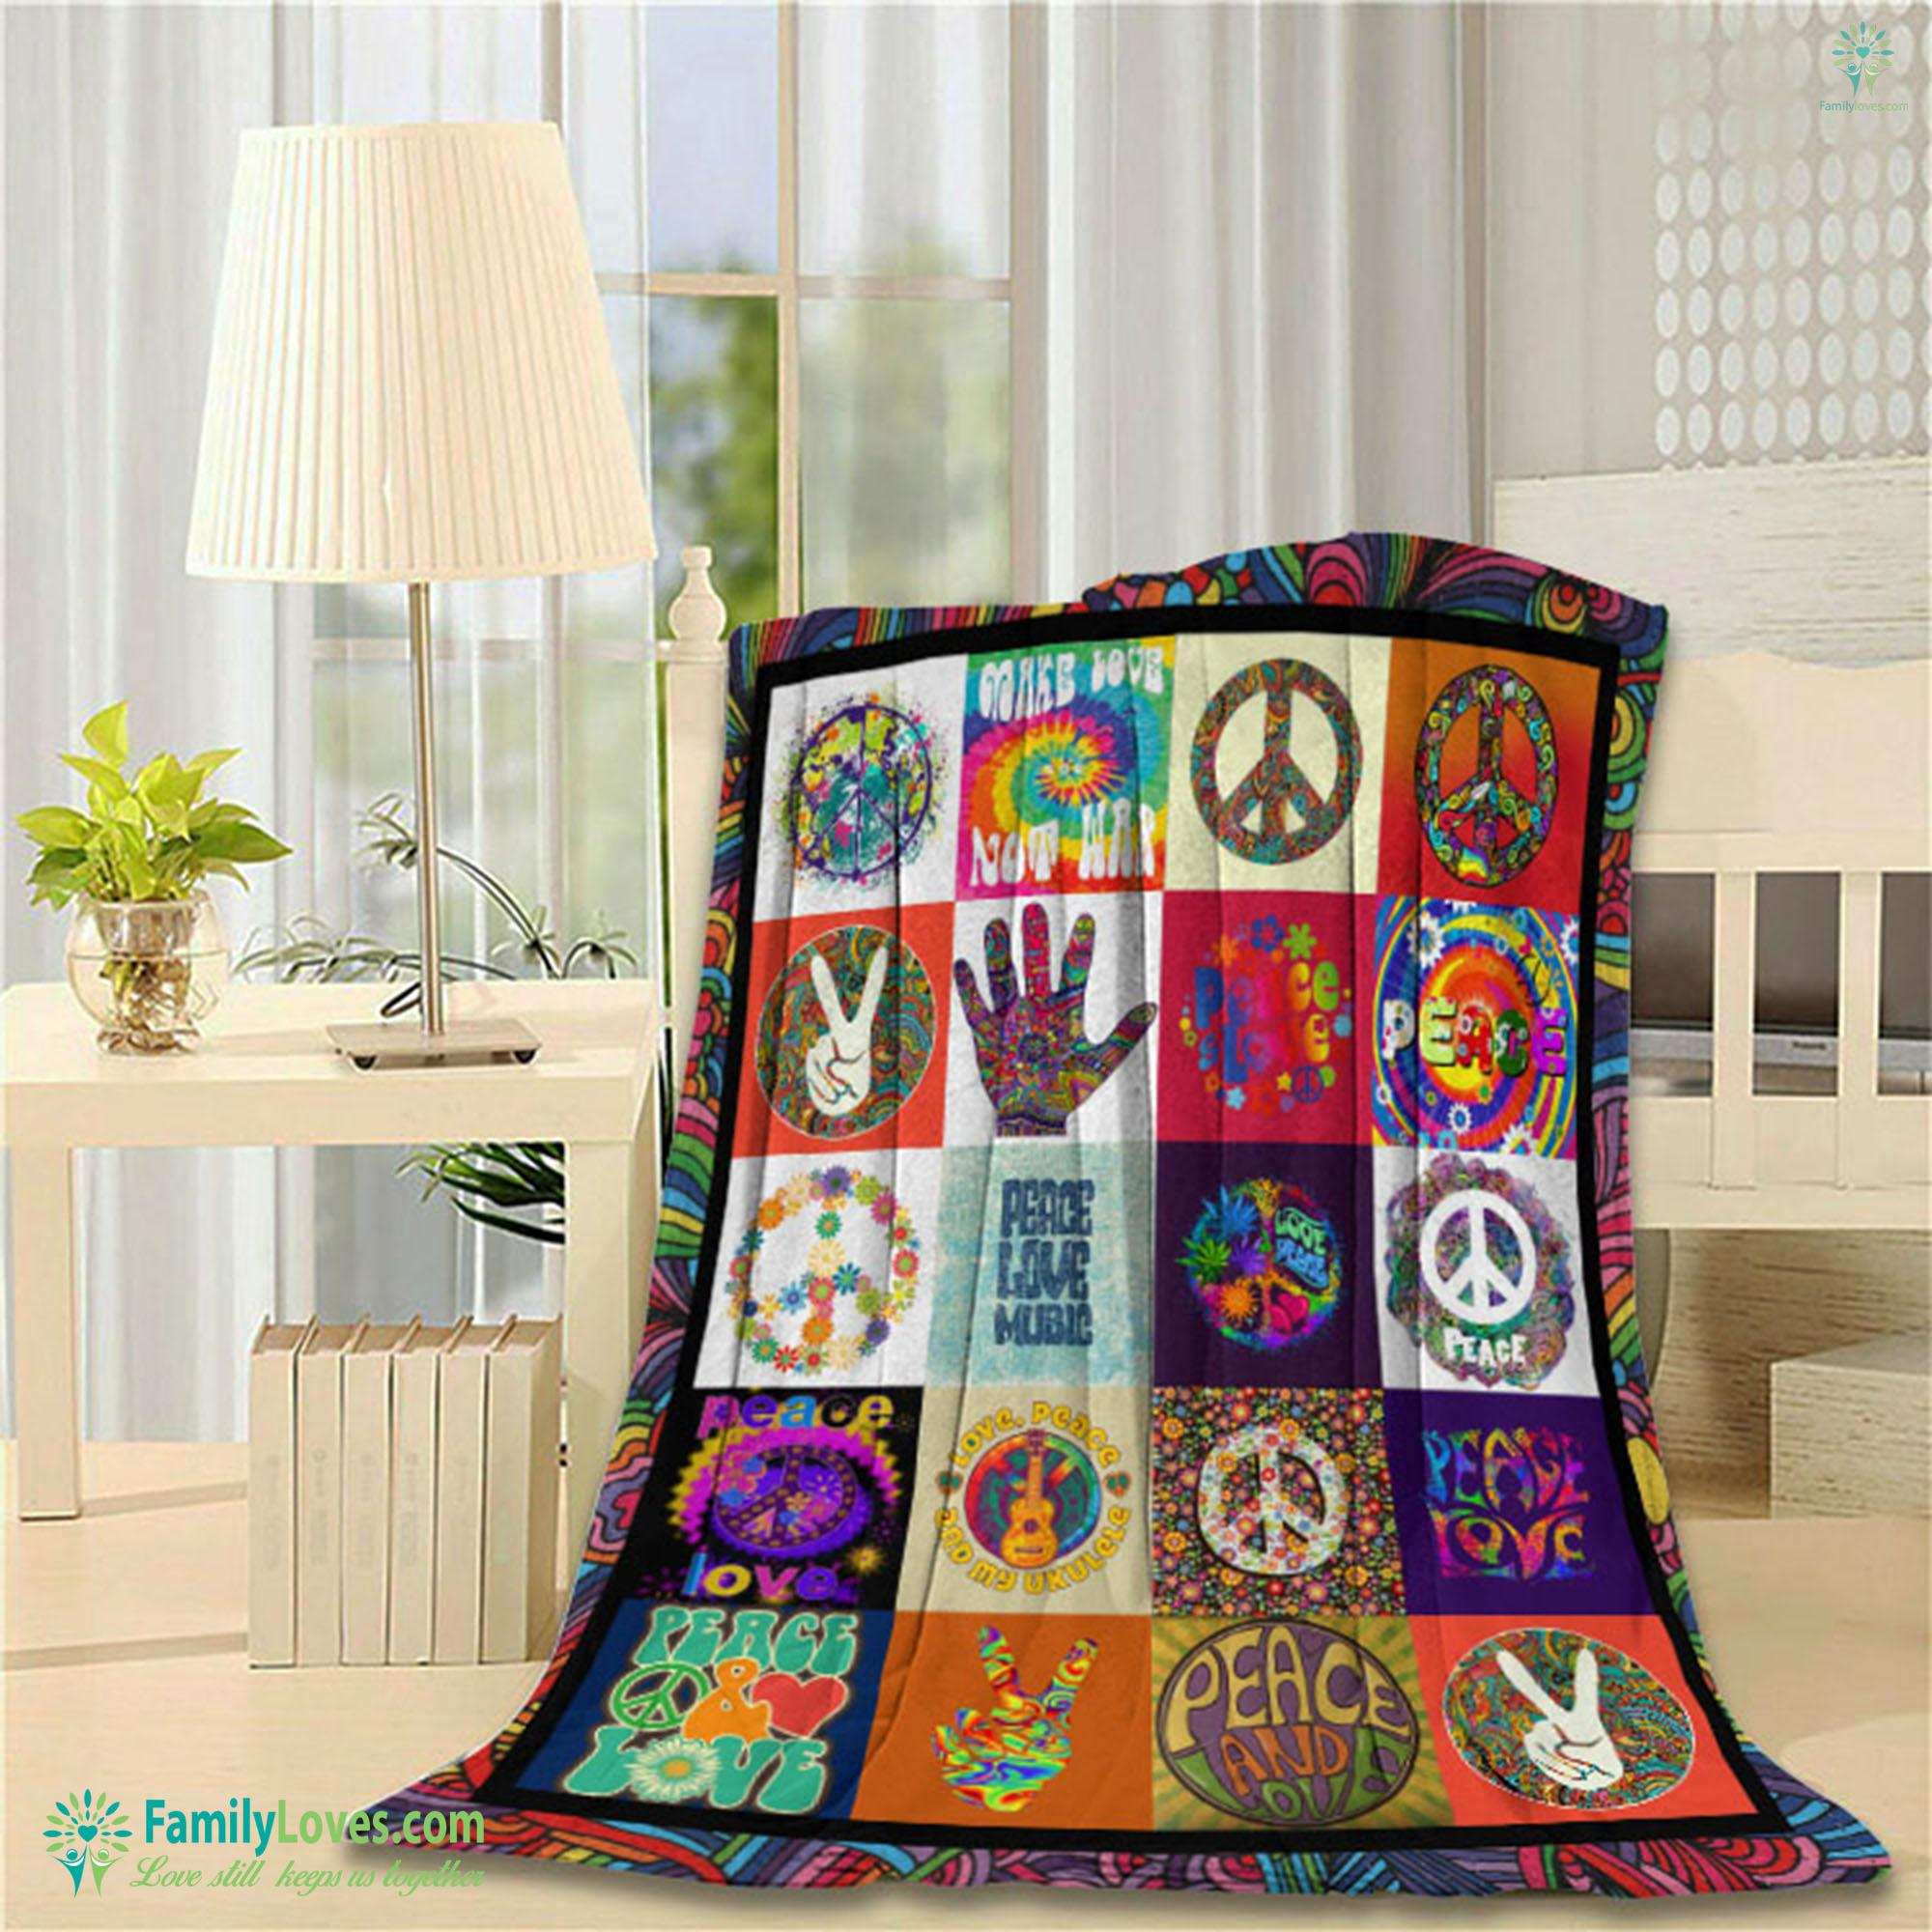 Love Peace Music Copy Blanket 6 Familyloves.com